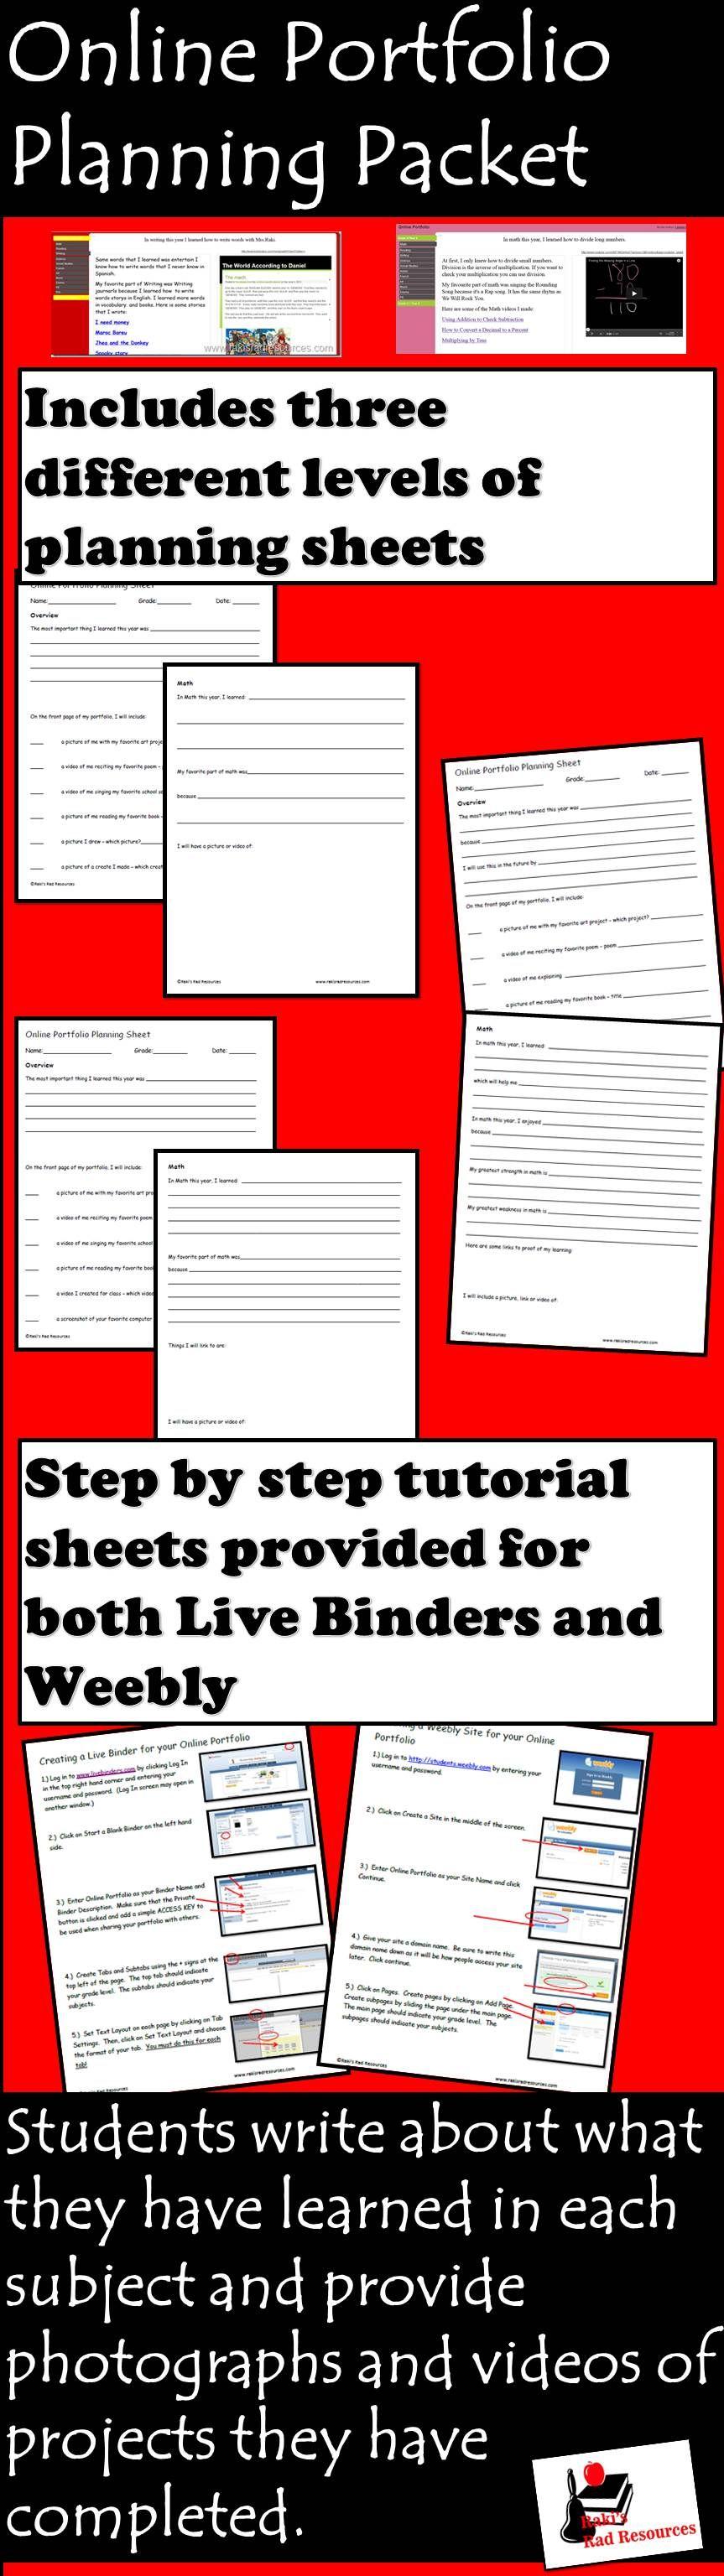 Student Created Online Portfolios Made Easy Student Portfolios Student Created Online Portfolio